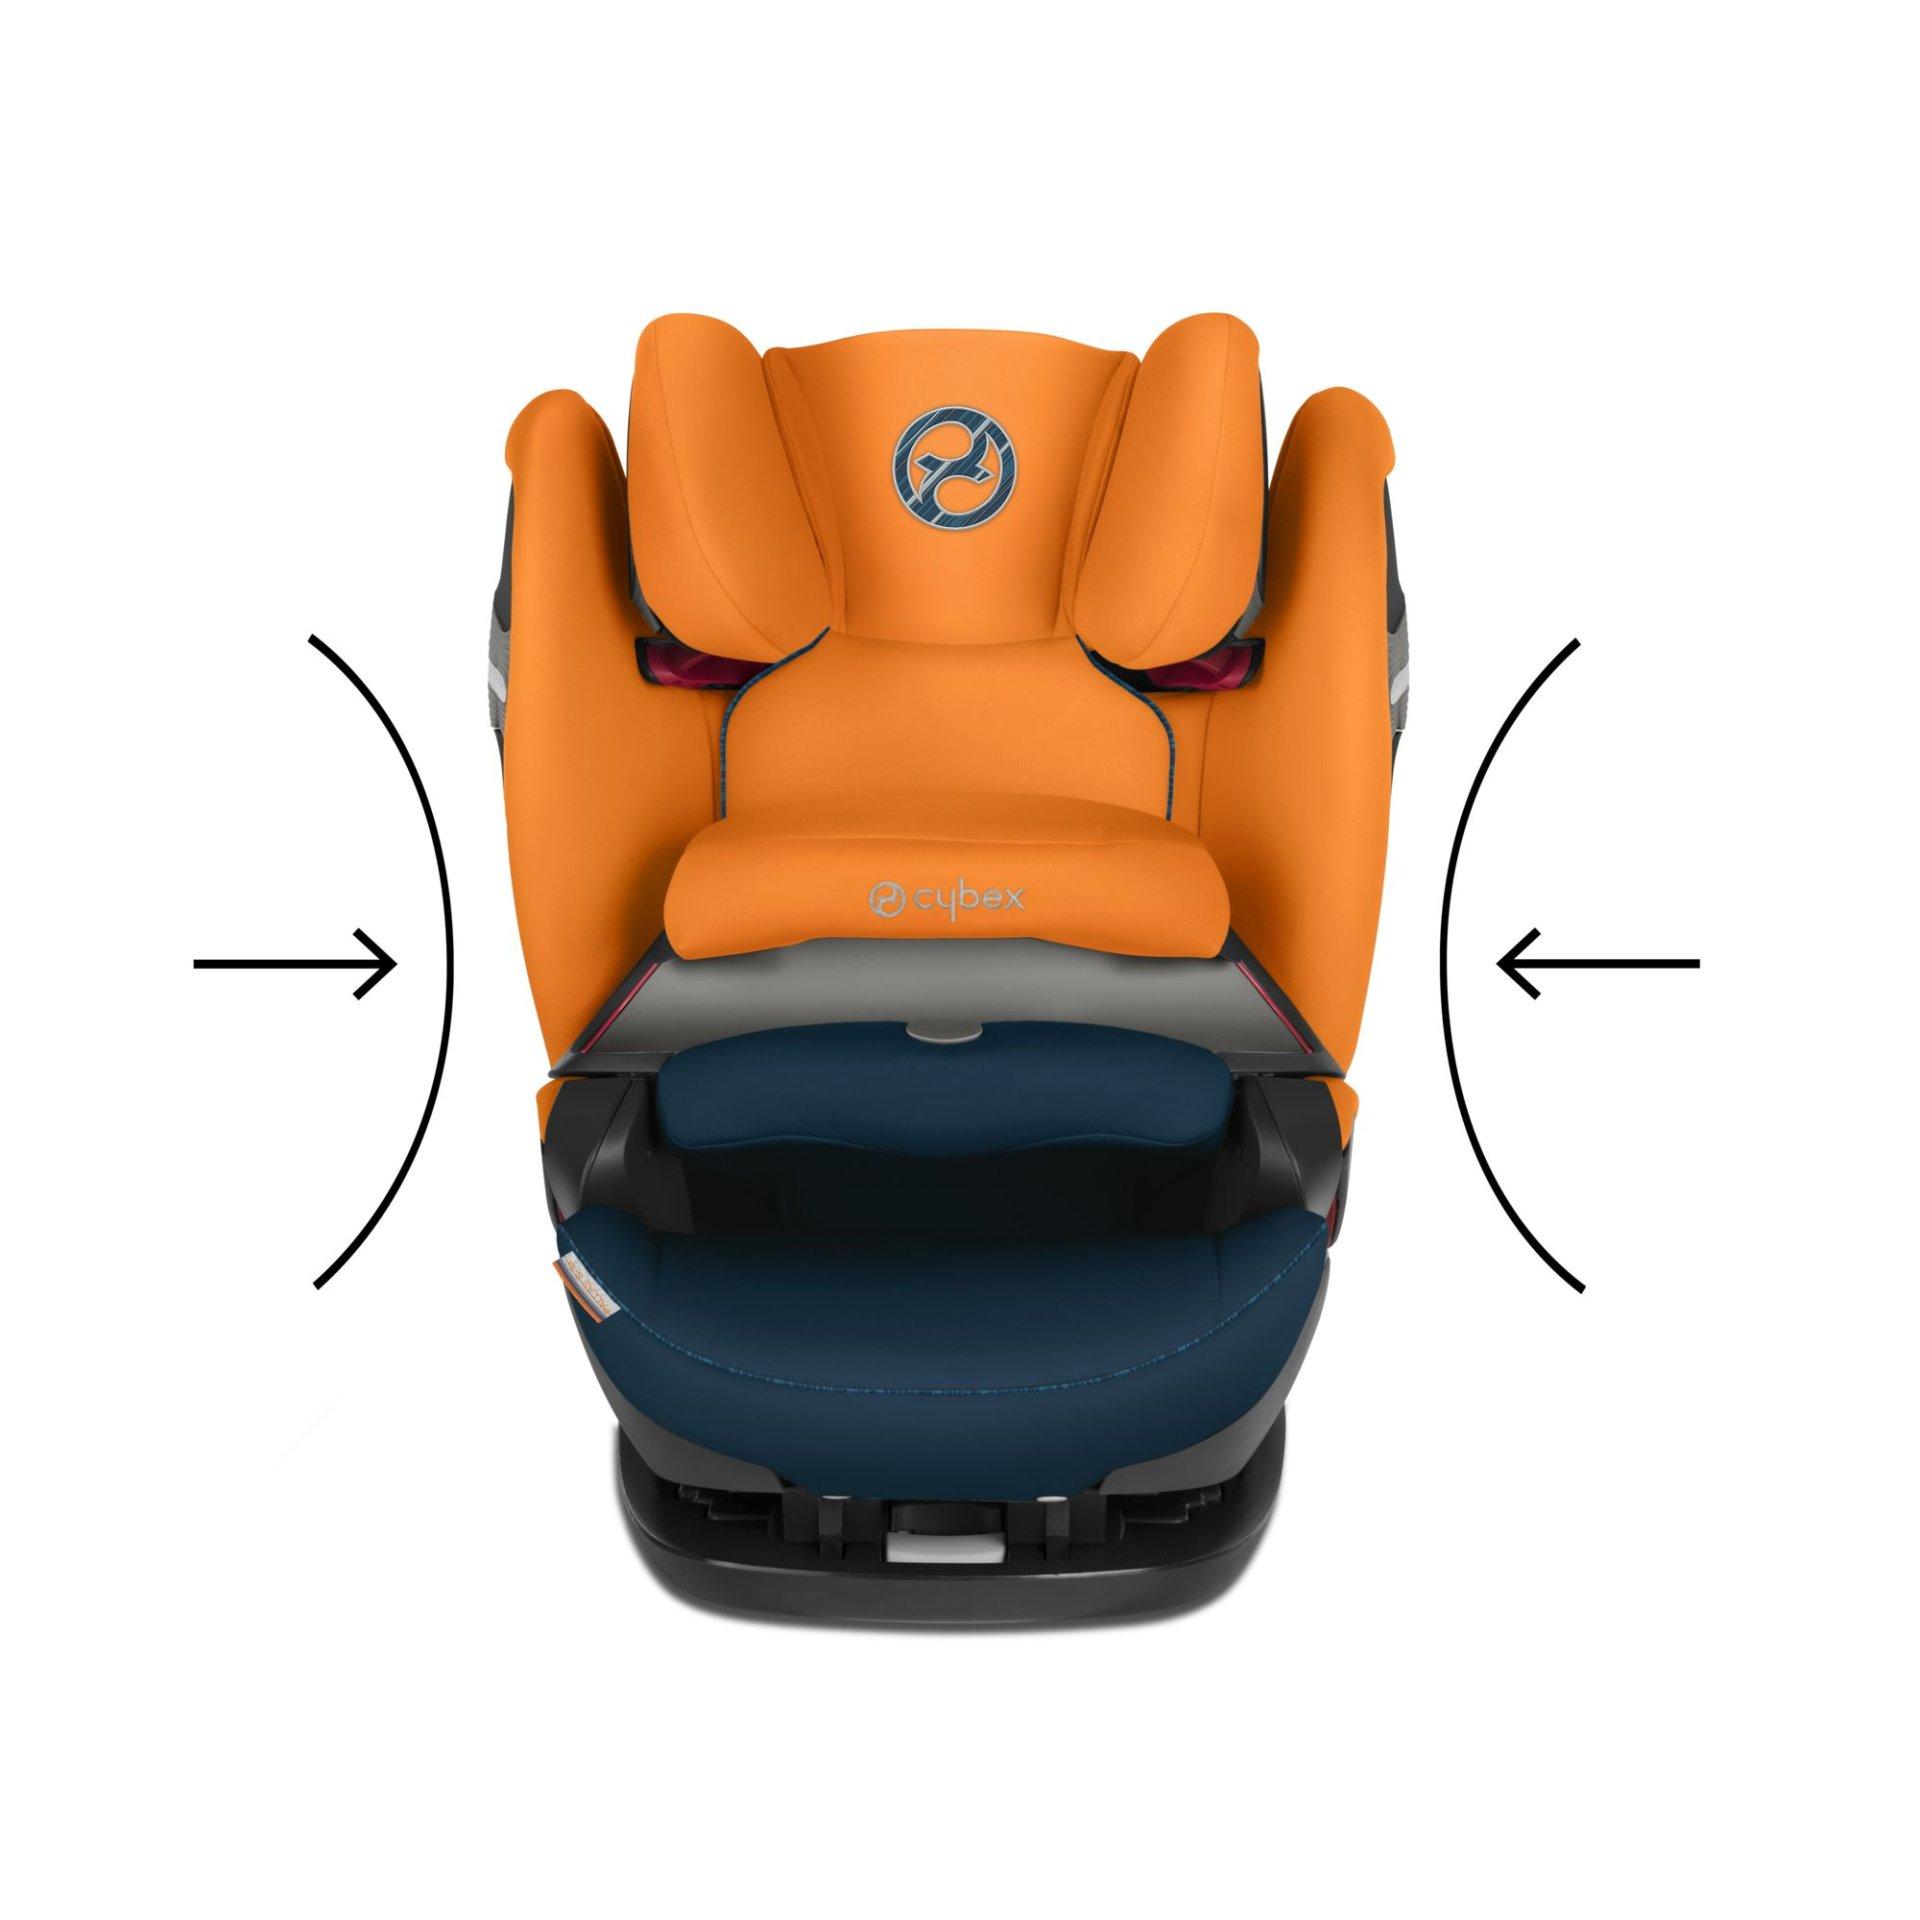 cybex child car seat pallas s fix 2019 indigo blue navy. Black Bedroom Furniture Sets. Home Design Ideas